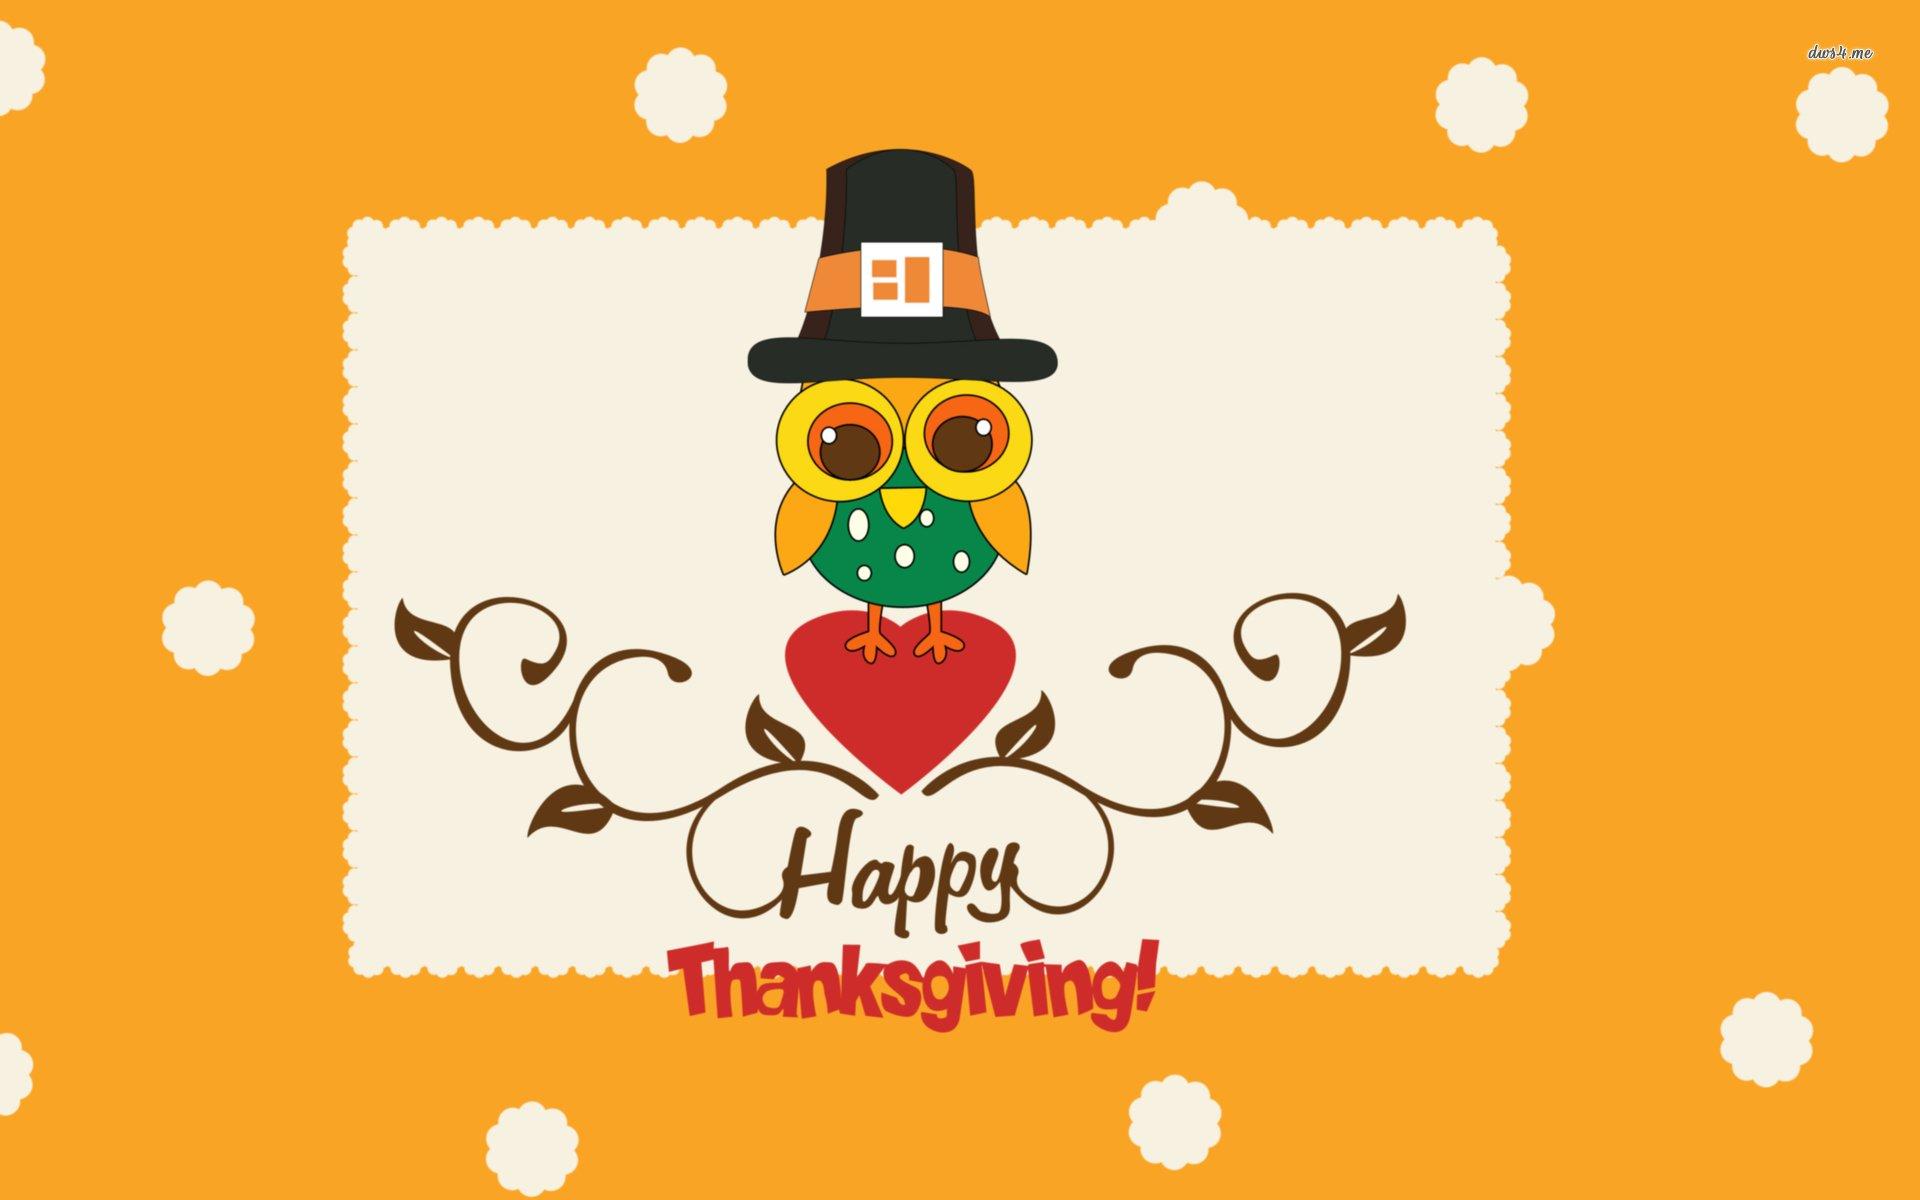 Wallpaper Leaves Falling Thanksgiving Wallpaper Hd Free Download 2018 Pixelstalk Net